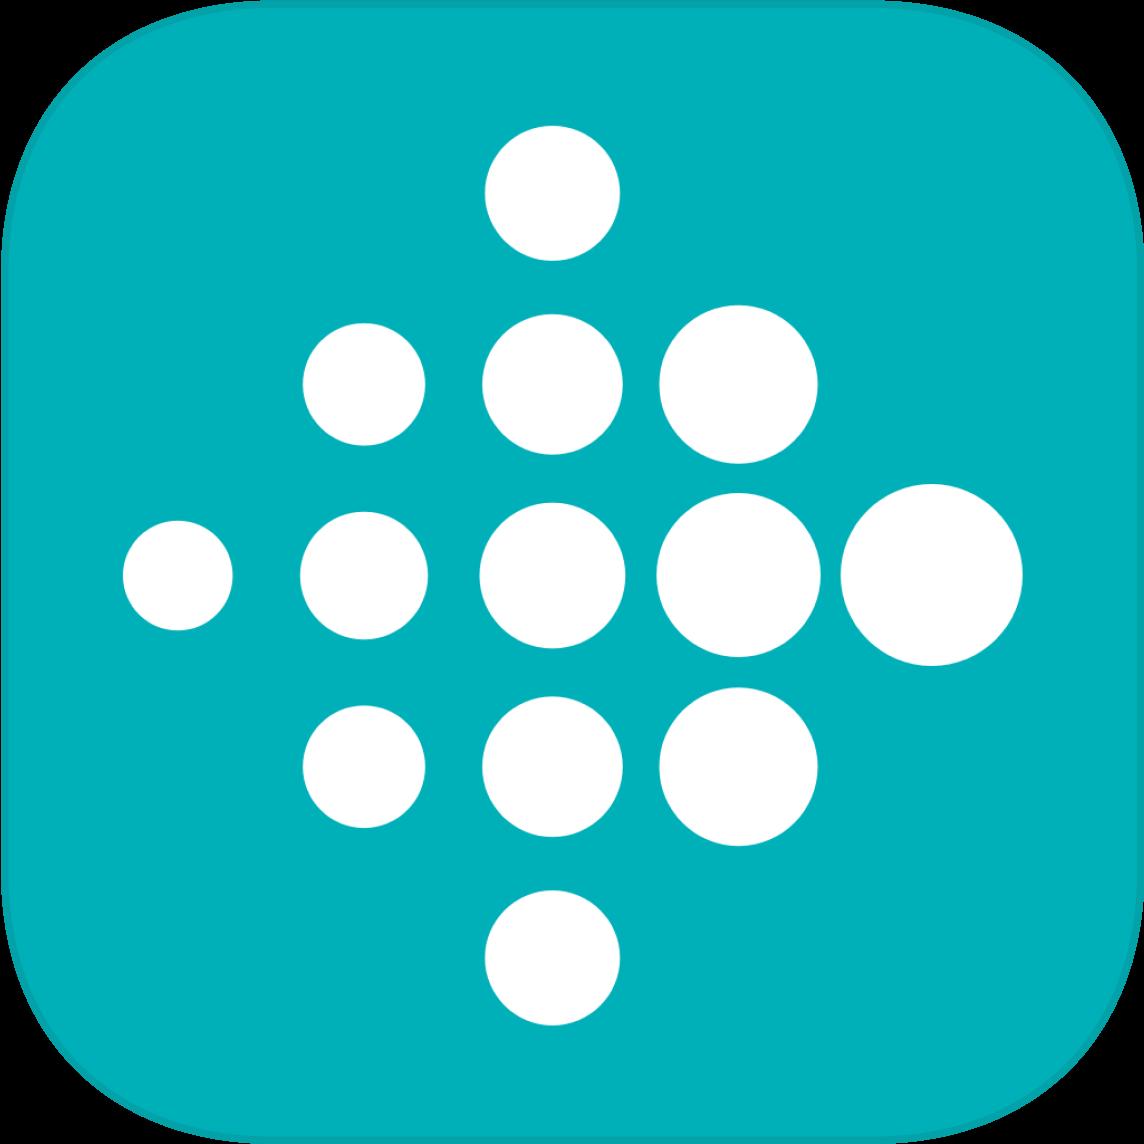 logo de l'app fitbit